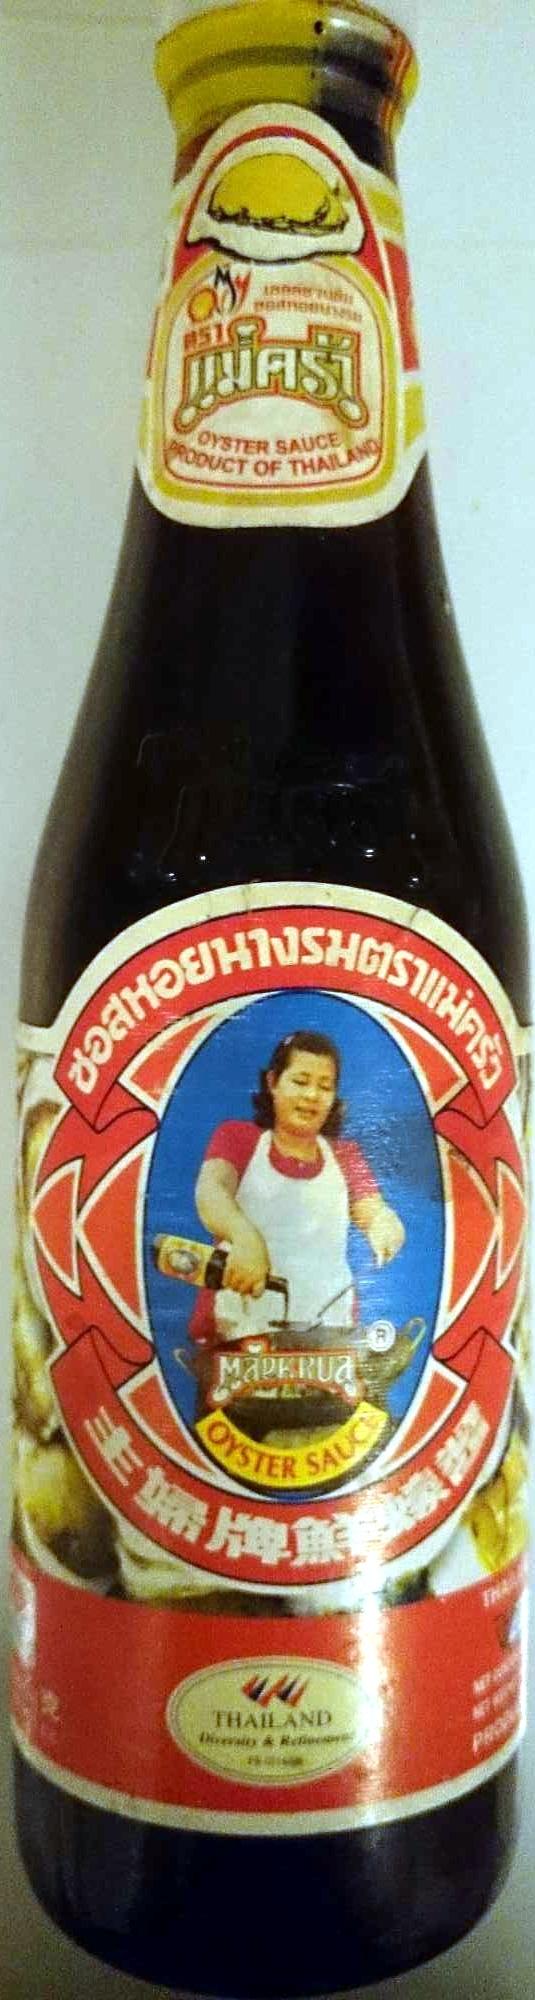 Maekrua, Oyster Sauce - Product